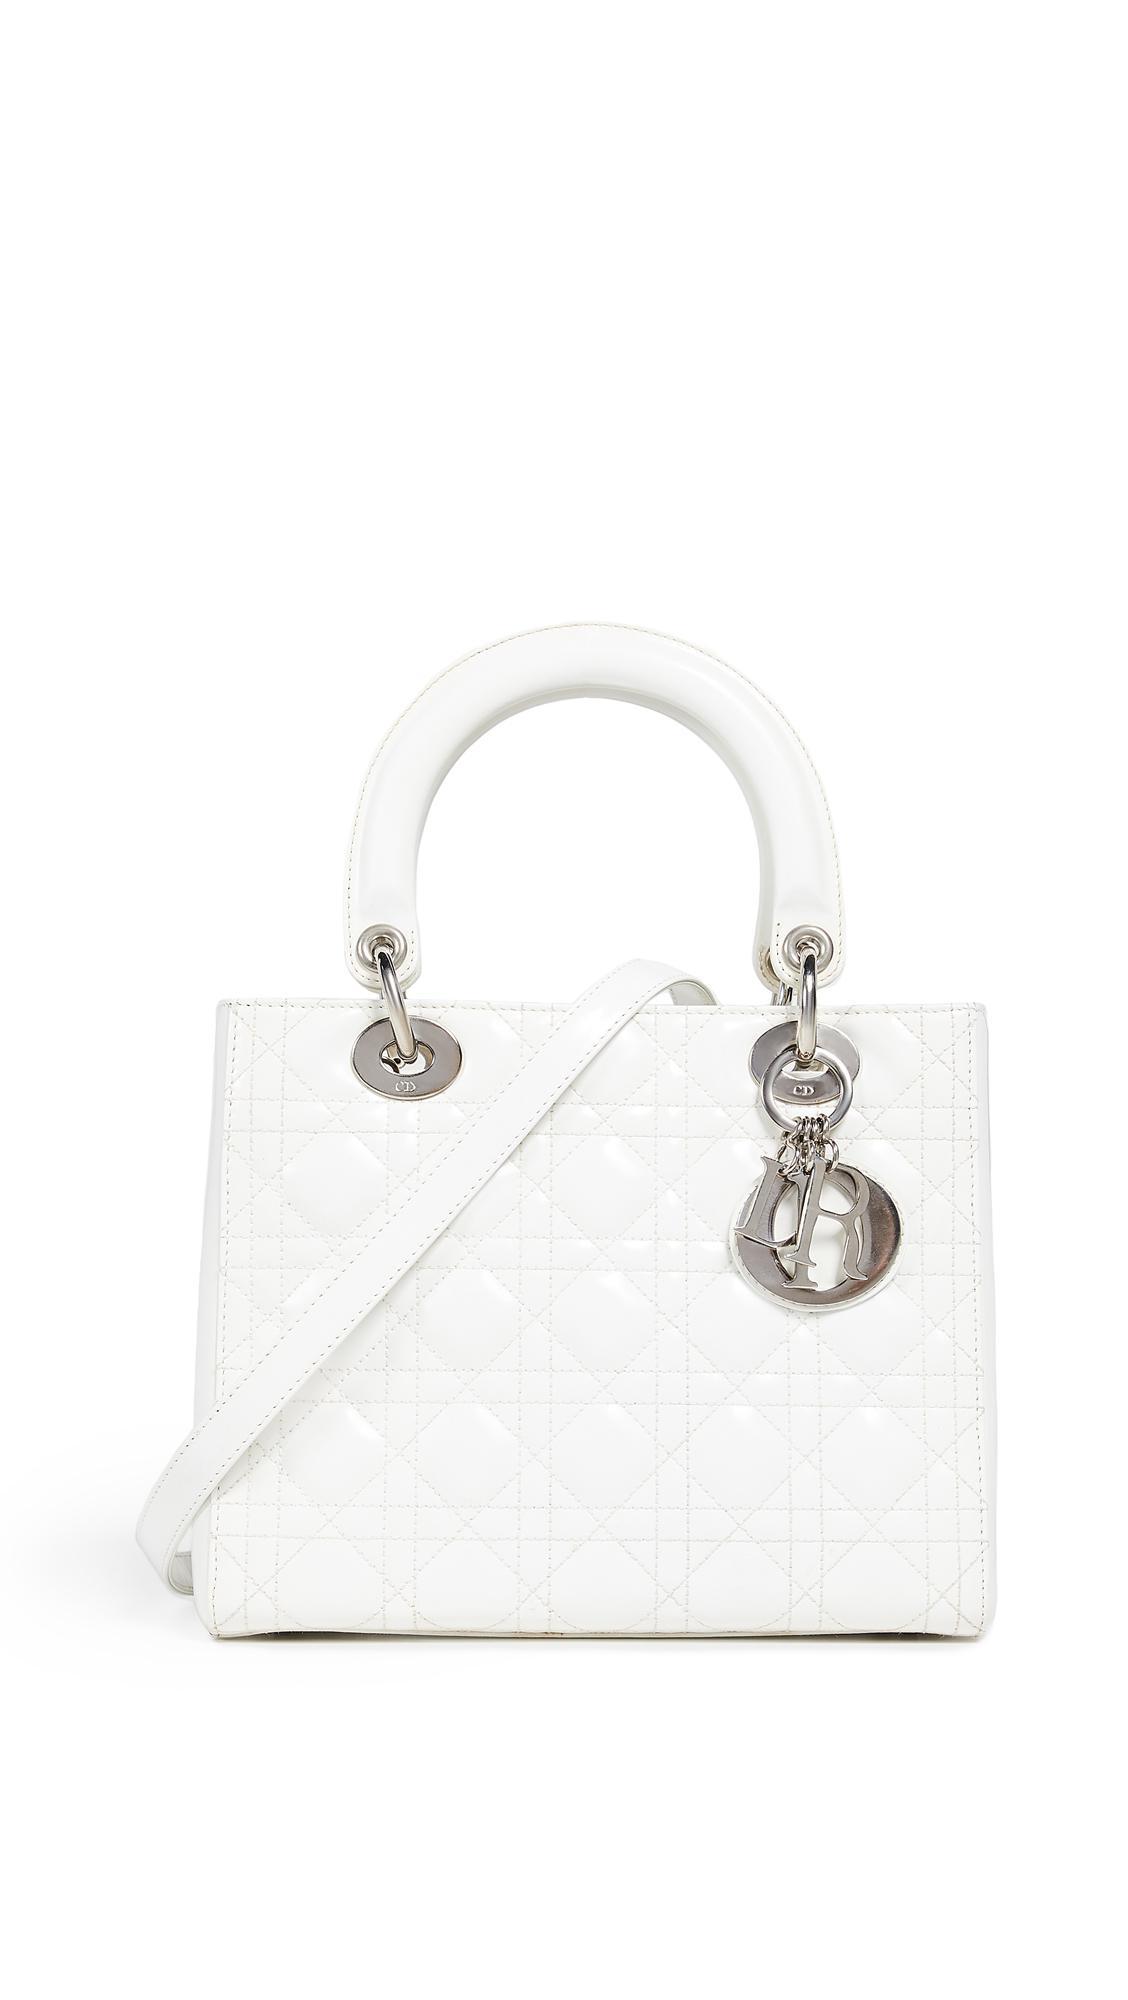 2b377877f00 Lyst - What Goes Around Comes Around Dior White Patent Lady Dior ...